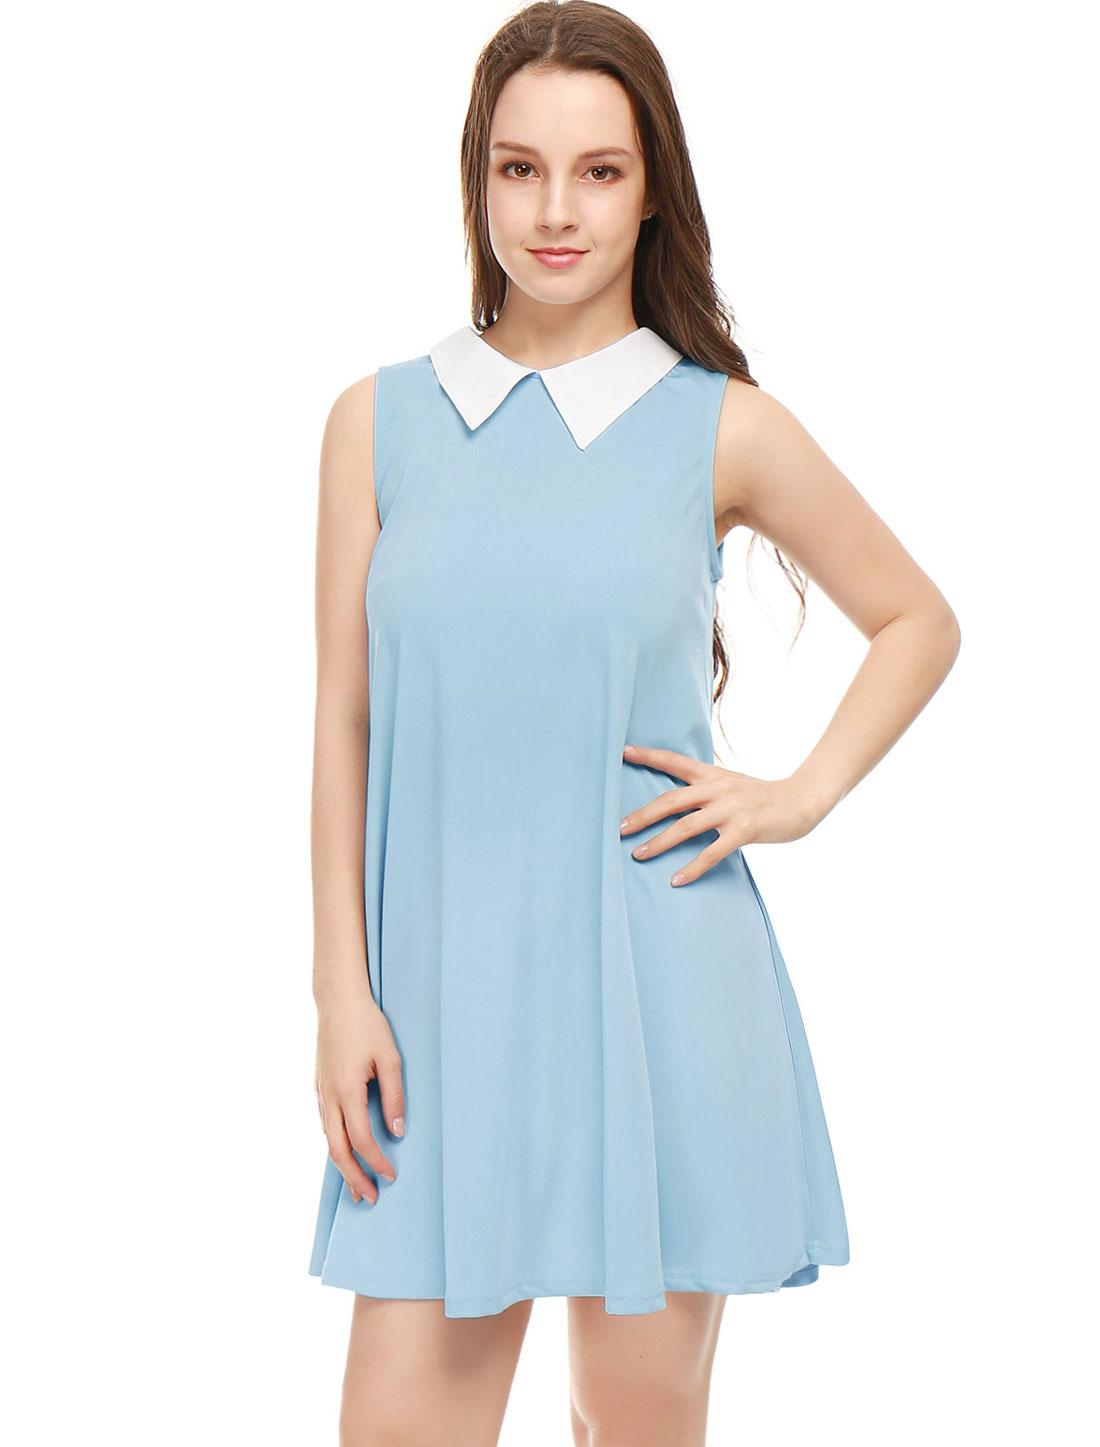 Women Contrast Color Peter Pan Collar Sleeveless Swing Dress Blue M